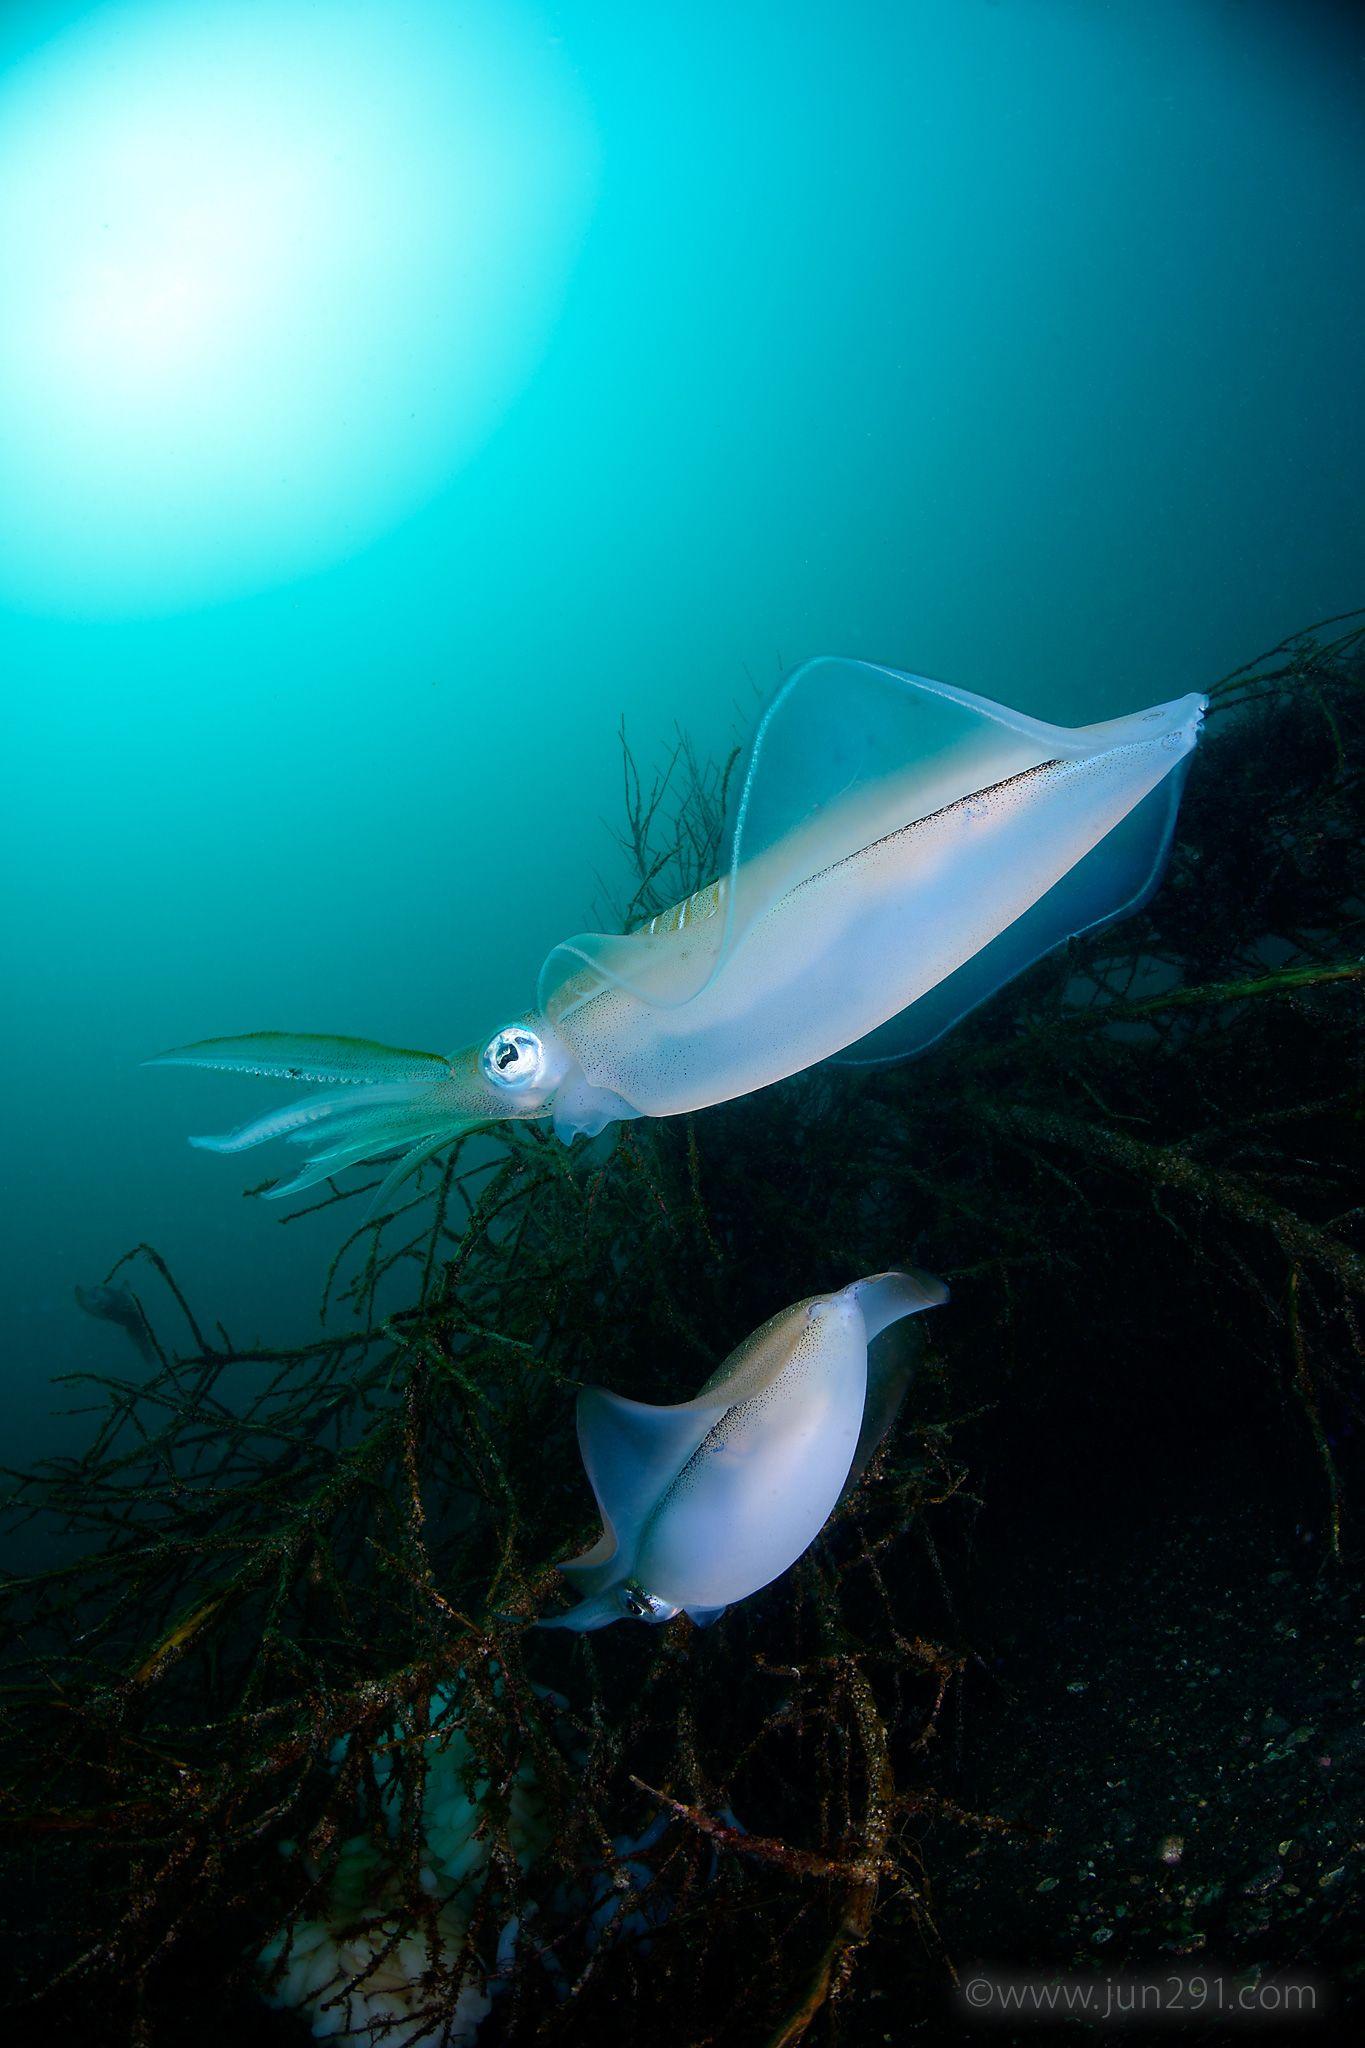 Bigfin Reef Squid (Sepioteuthis lessoniana) アオリイカ Futo, Shizuoka, Japan